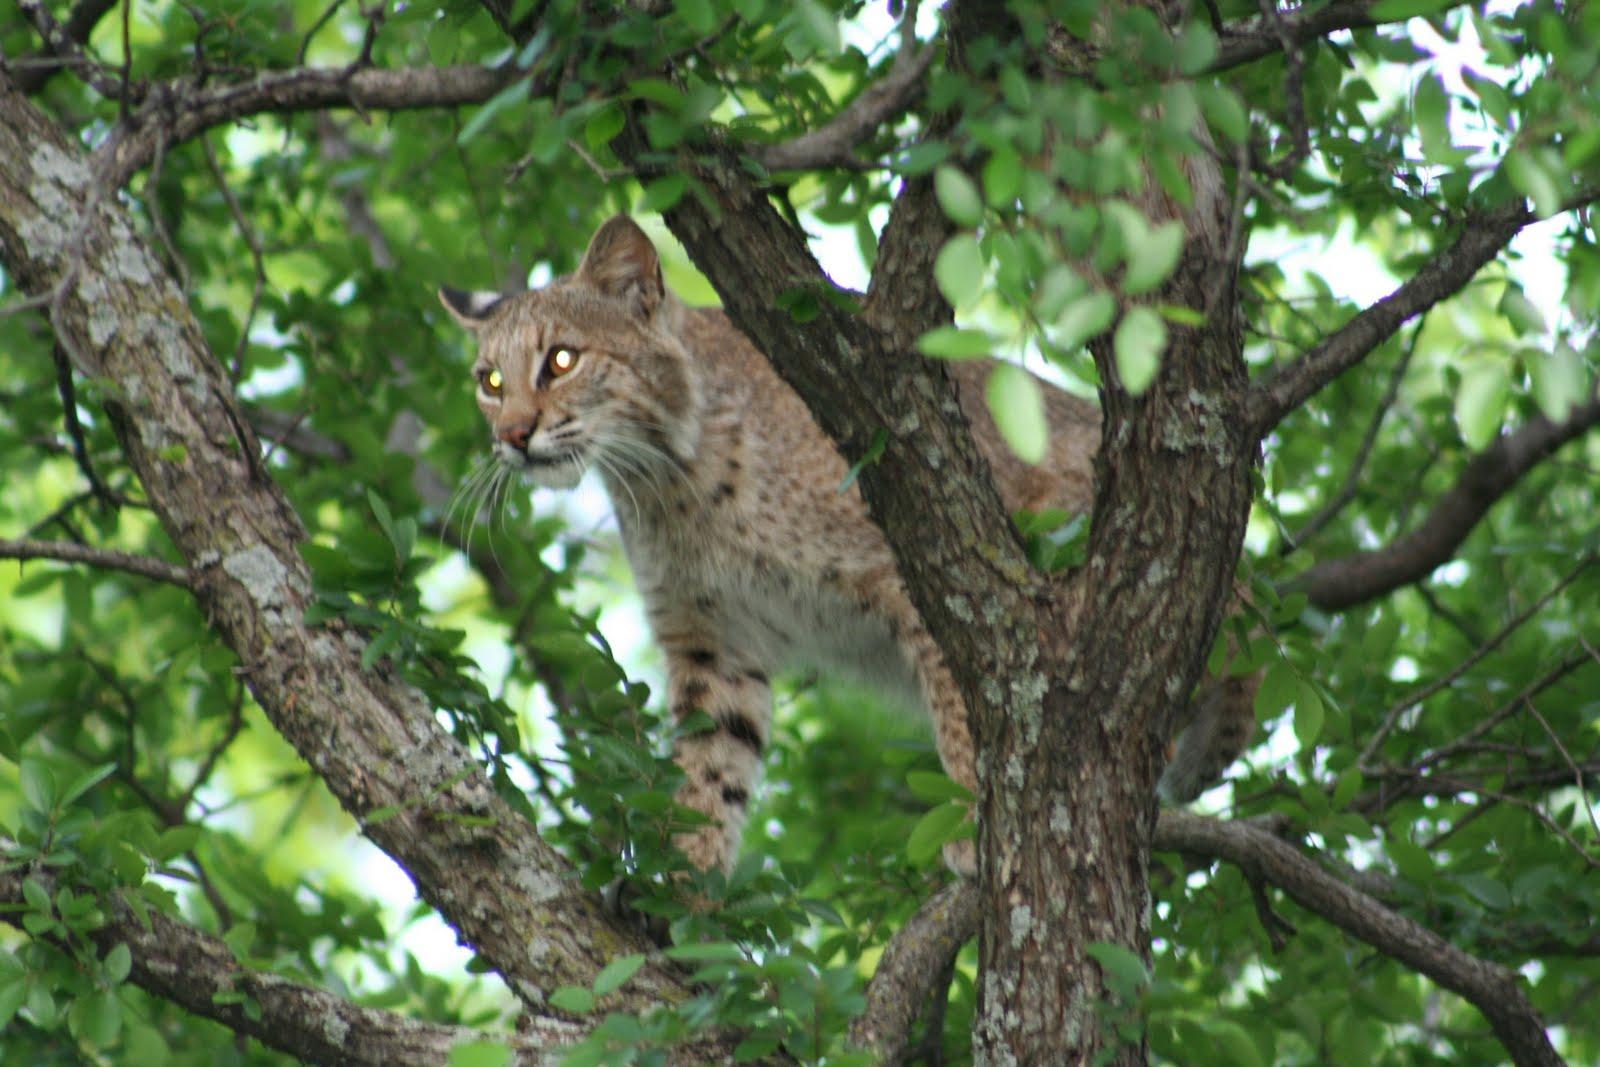 Texas Cryptid Hunter Bobcat Photos From Plano Texas